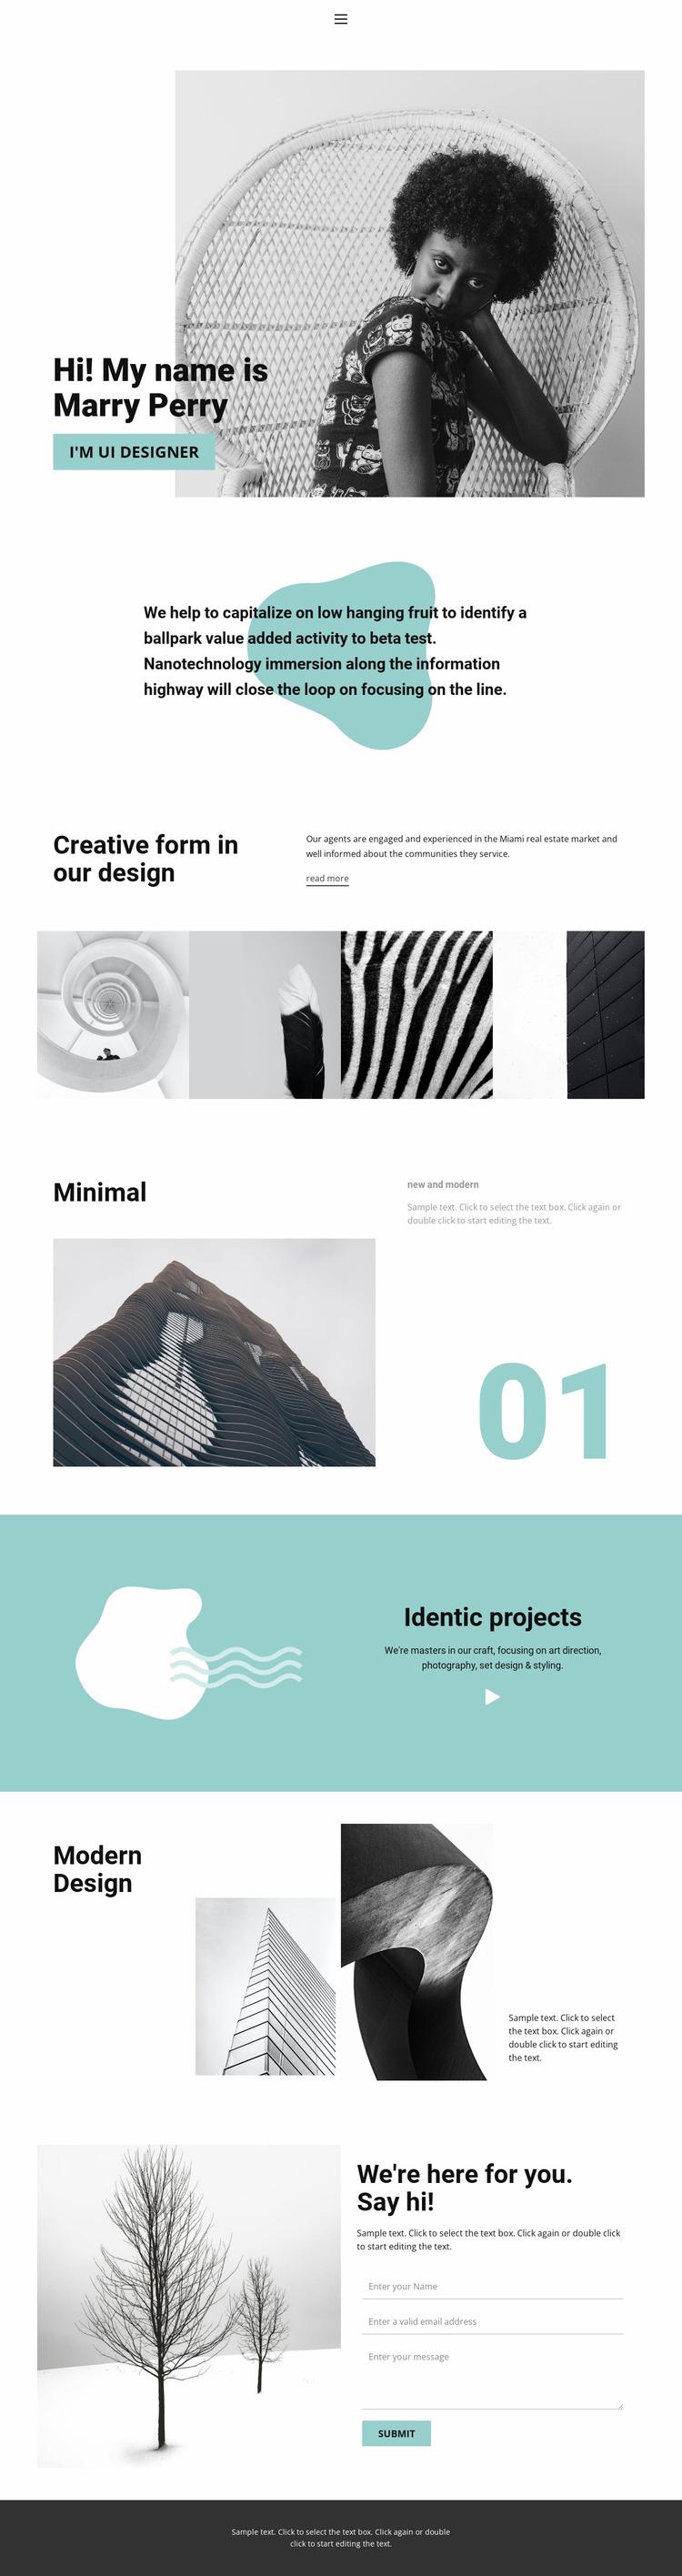 Web design from our studio Website Mockup